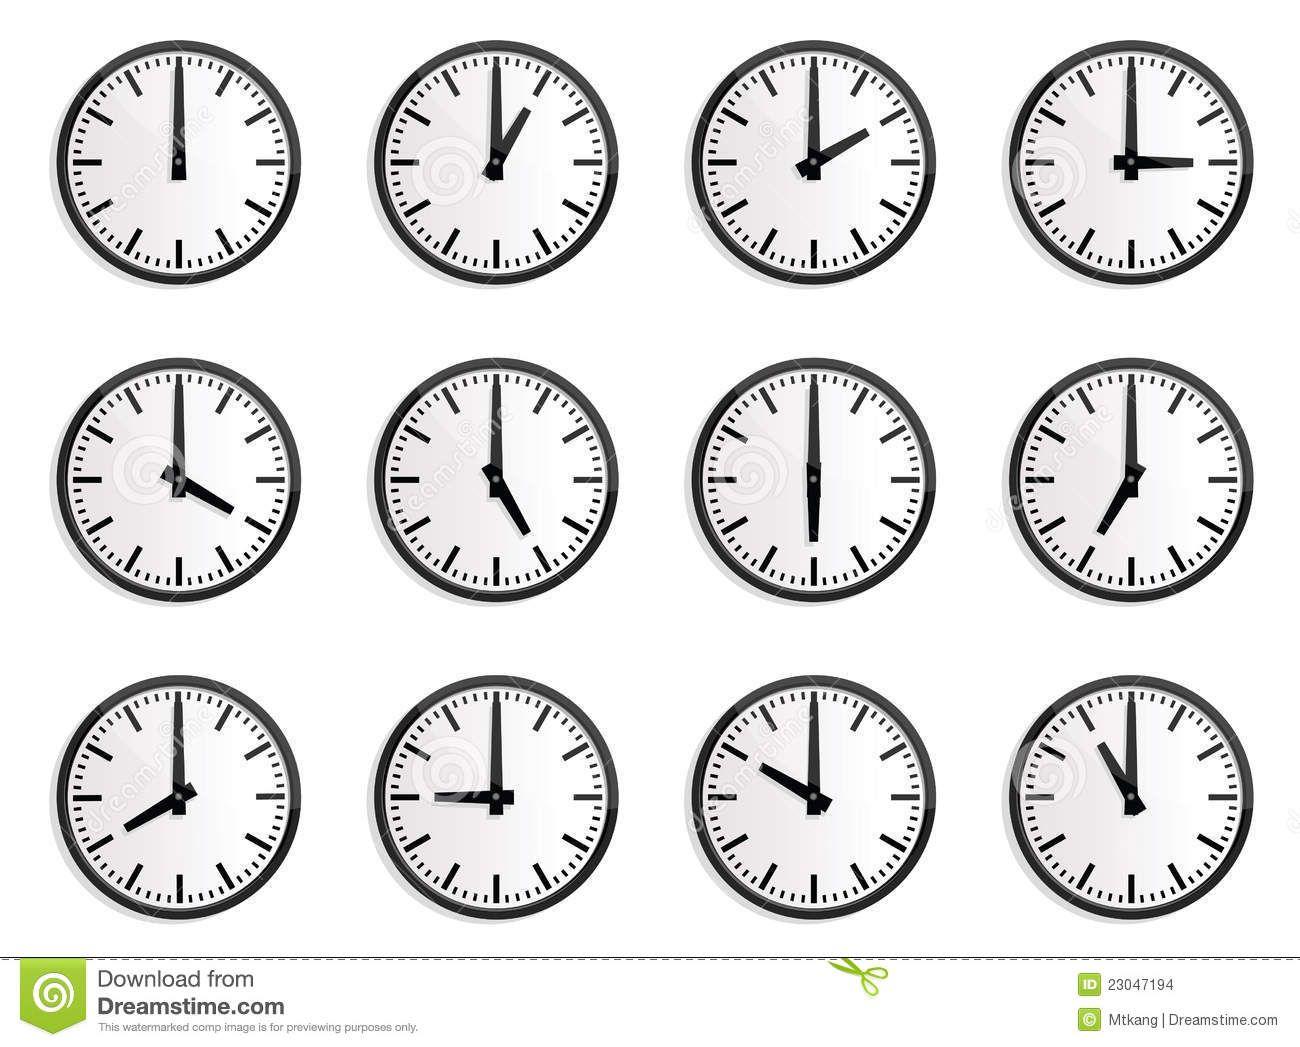 clock world Google habor Pinterest Searching